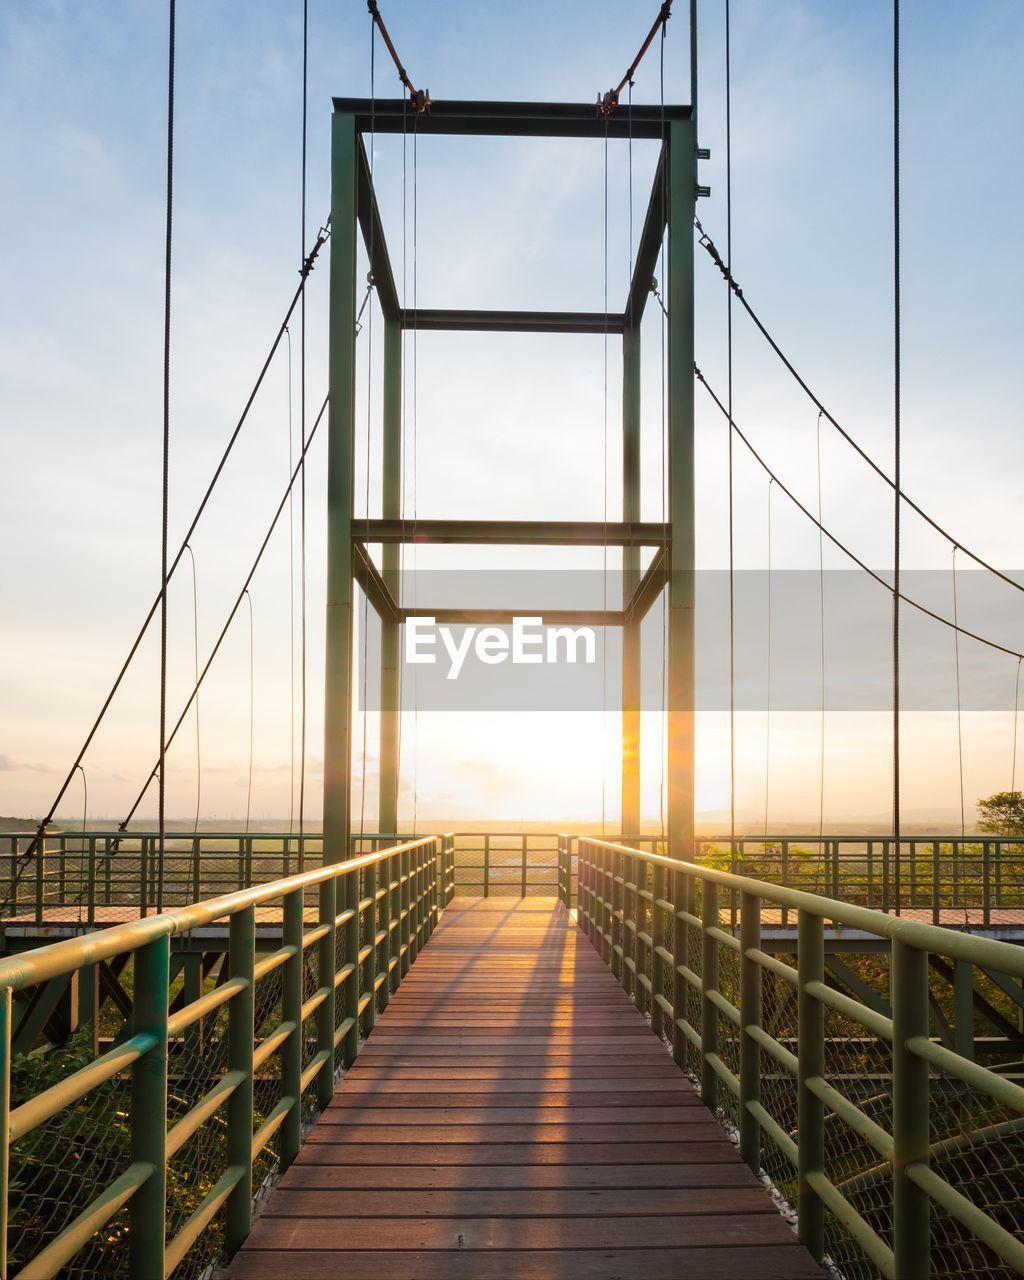 Footbridge against sky at sunset